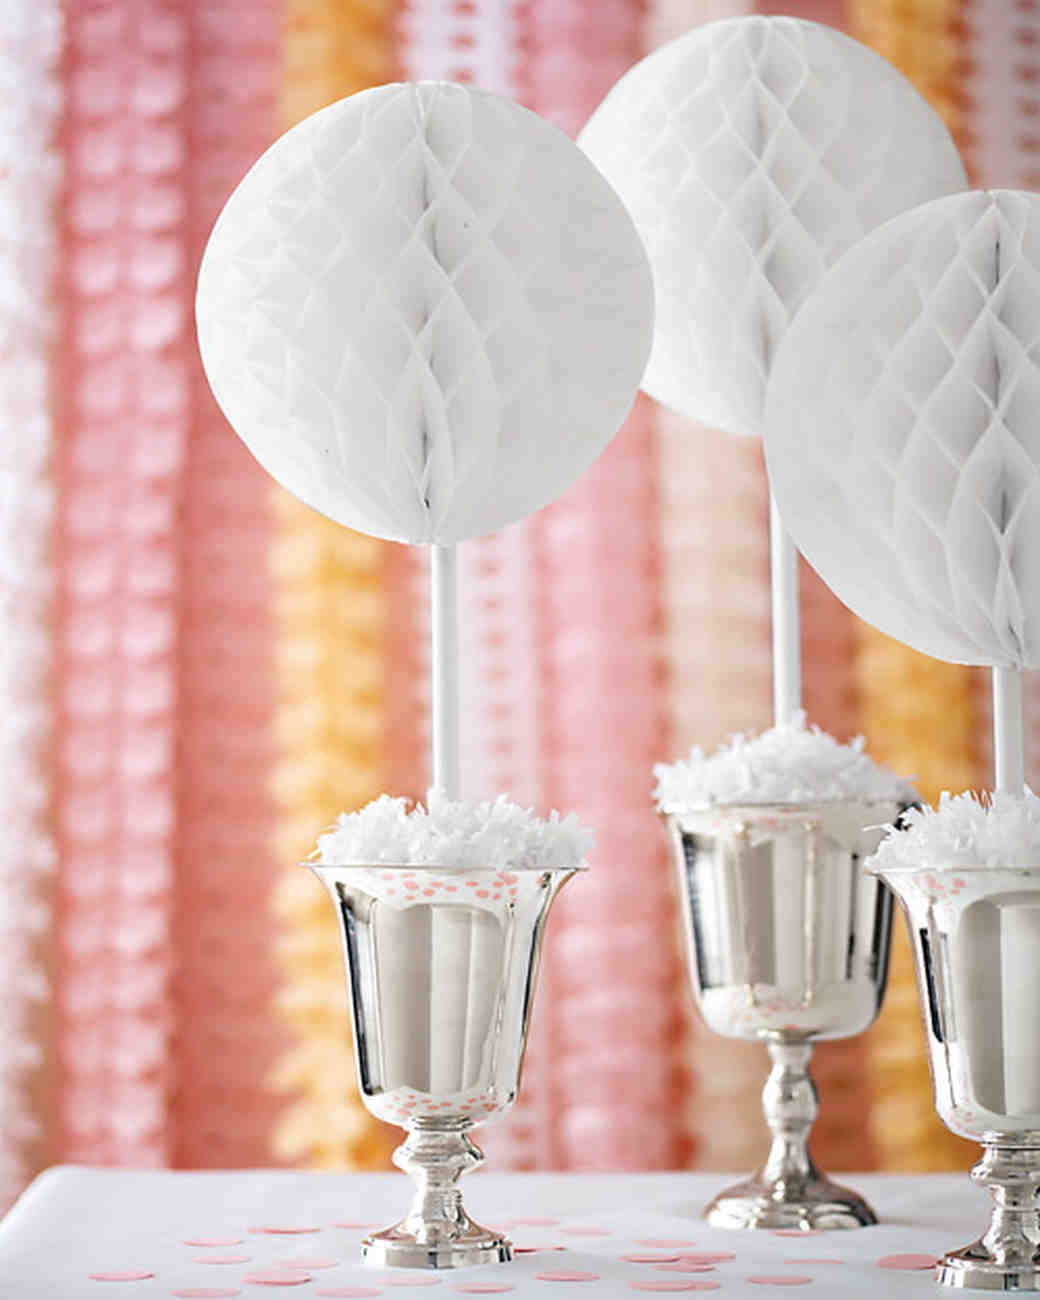 Pop-Up Party Decorations | Martha Stewart Weddings